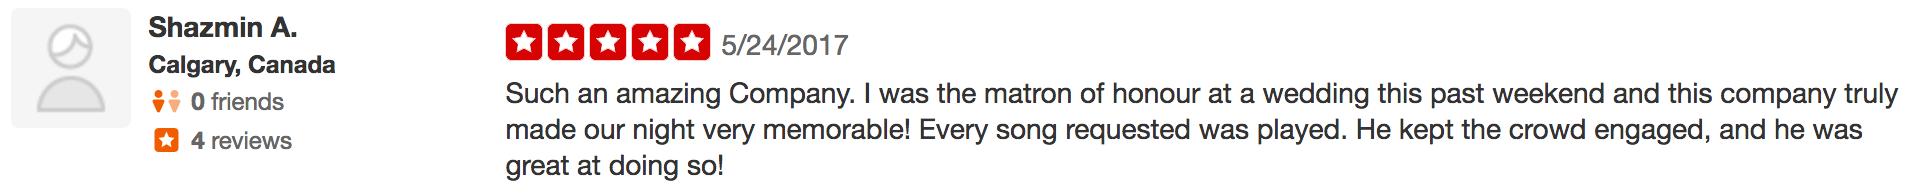 Shazmin says Great dj